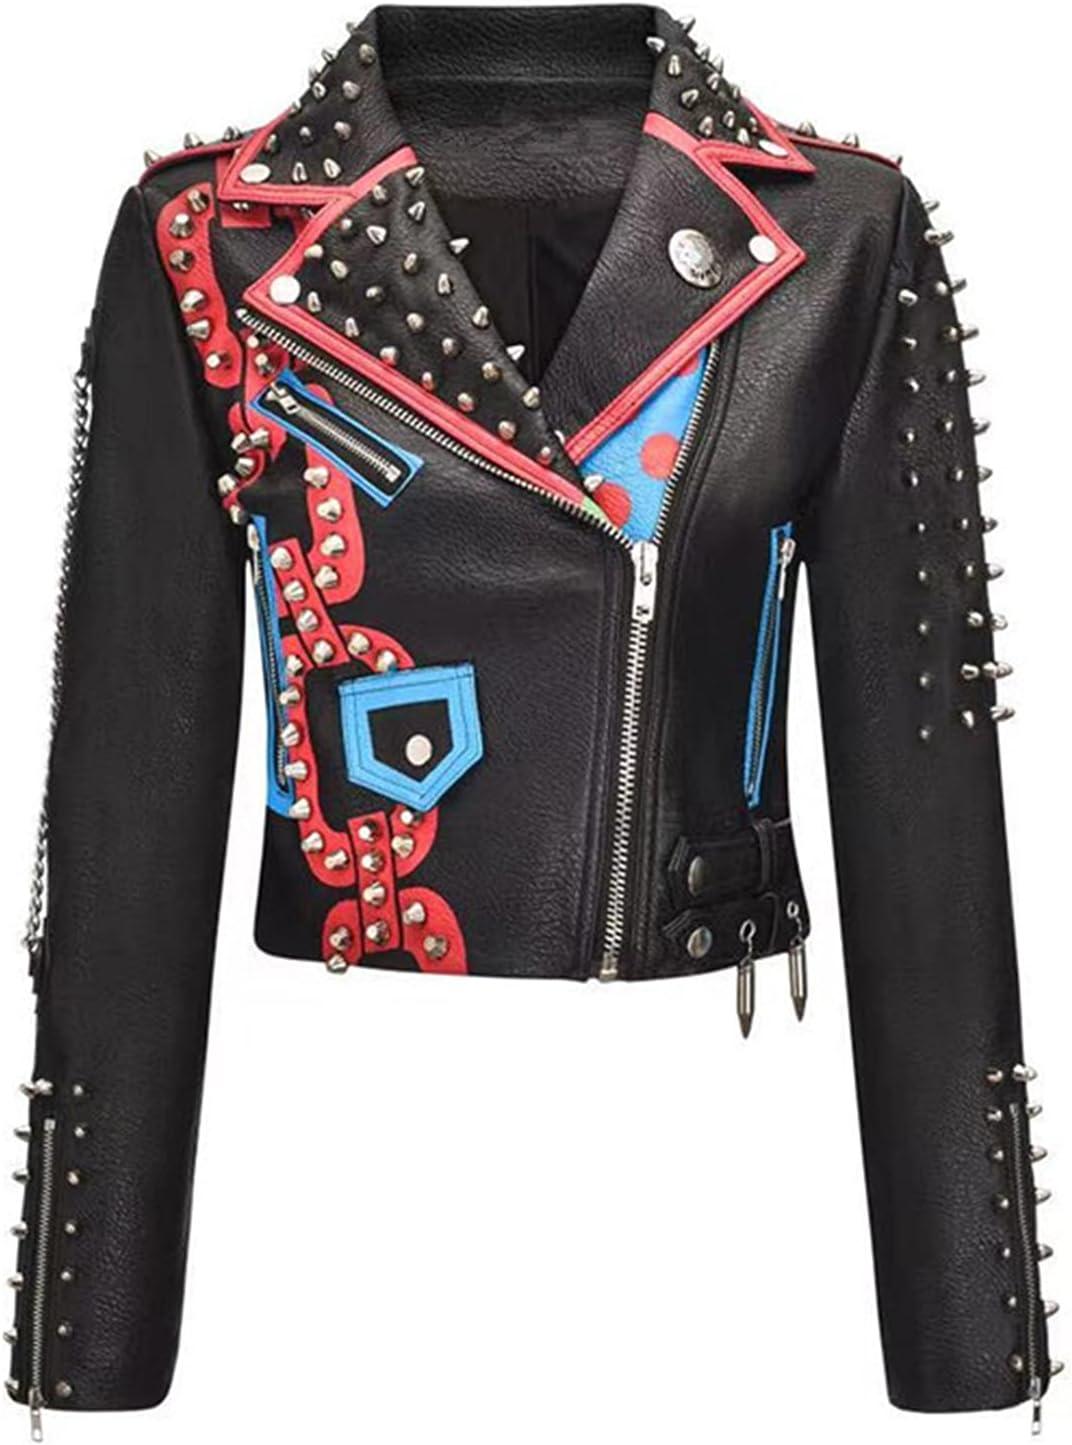 YHNY Women's Faux Leather Jacket Rivet Zipper Motorcycle Biker Graffiti Printed Letters Contrast Color Short Coat Black-M